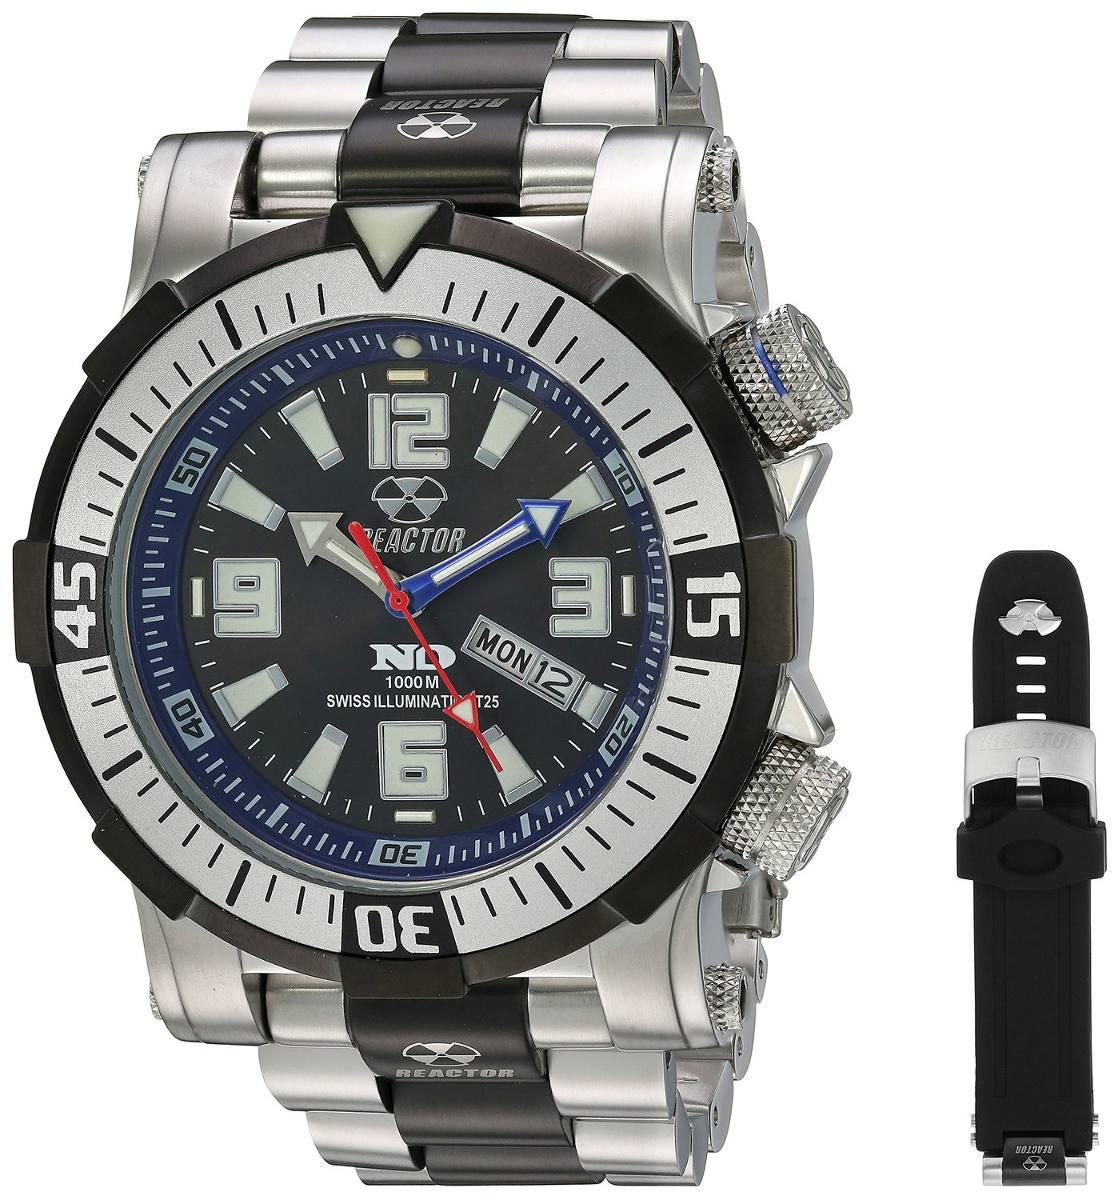 Poseidon Men's Classic Reactor Analog Le Reloj 55903 8n0ONkPwX